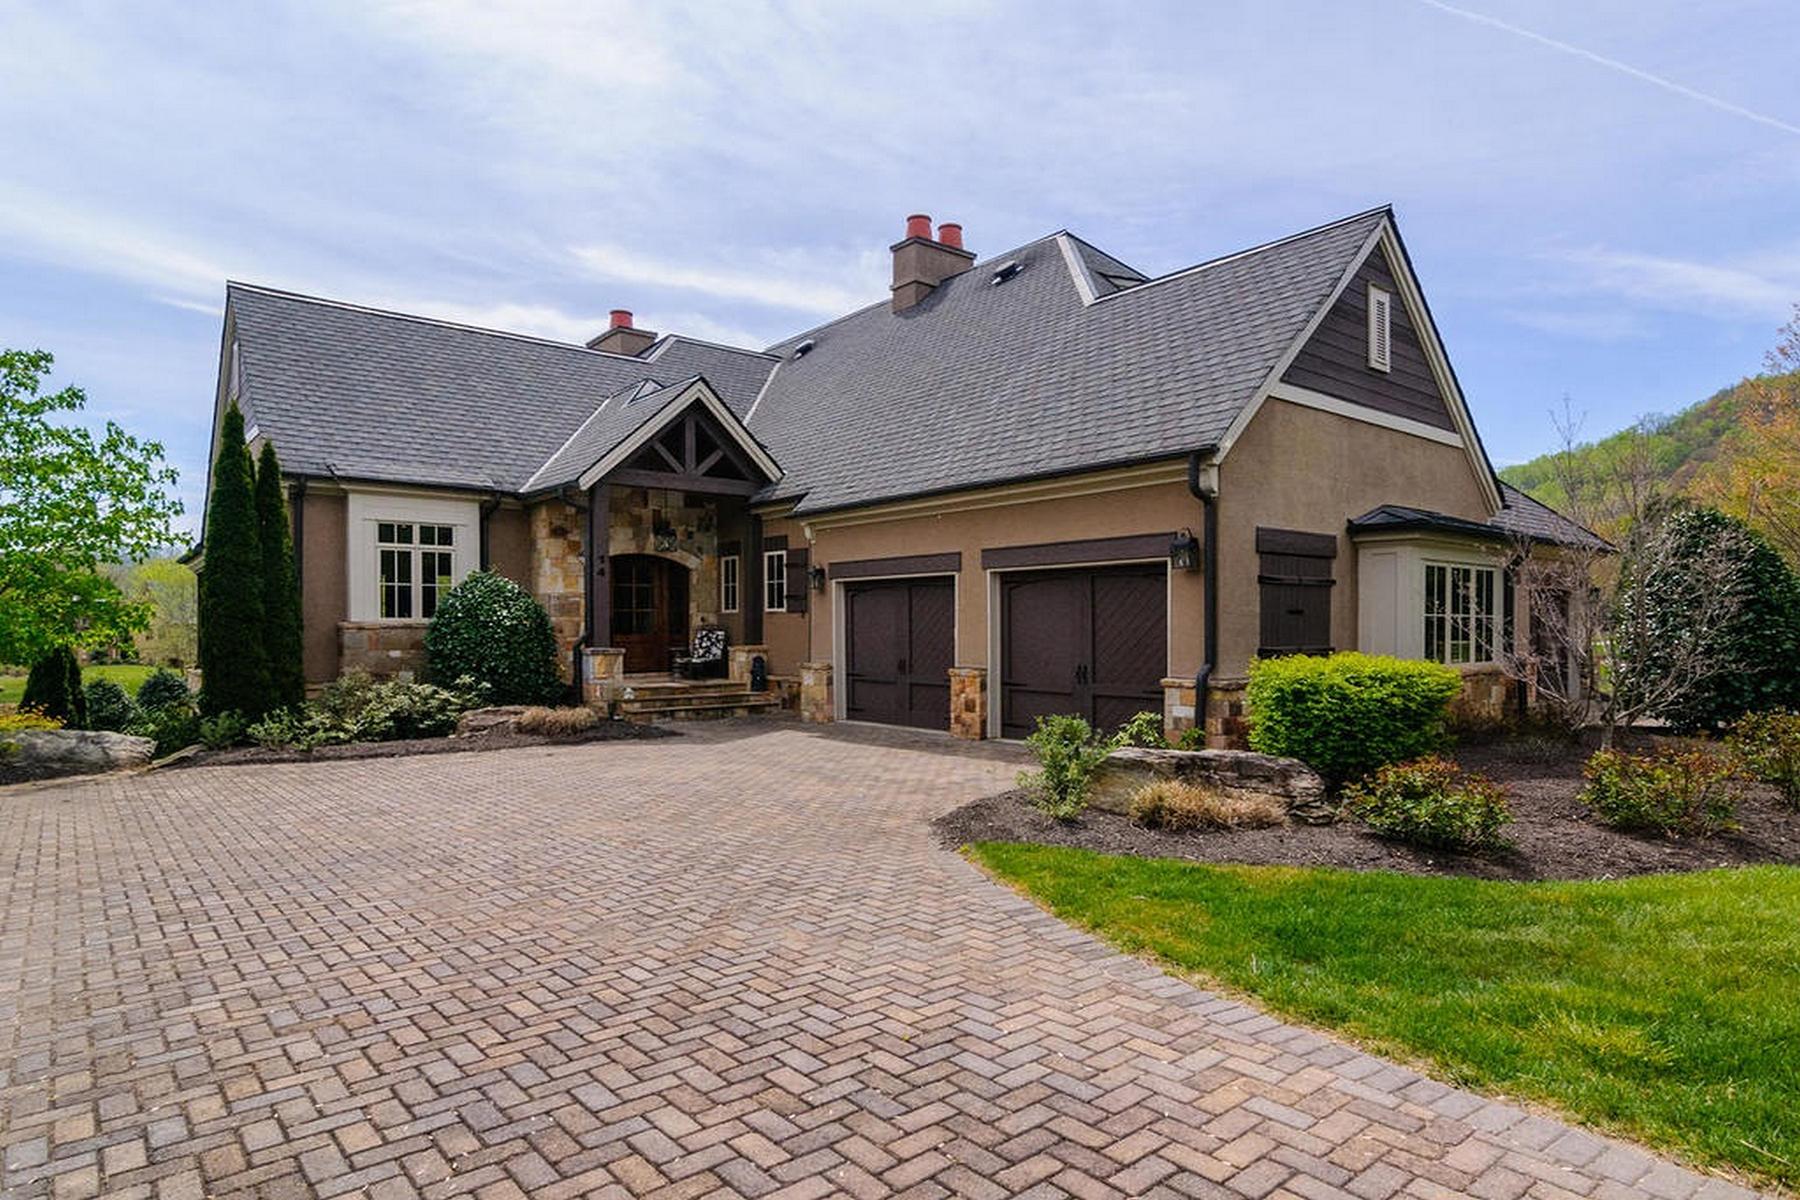 Condominium for Sale at THE CLIFFS AT WALNUT COVE 14 Foxbridge Way Arden, North Carolina, 28704 United StatesIn/Around: Asheville